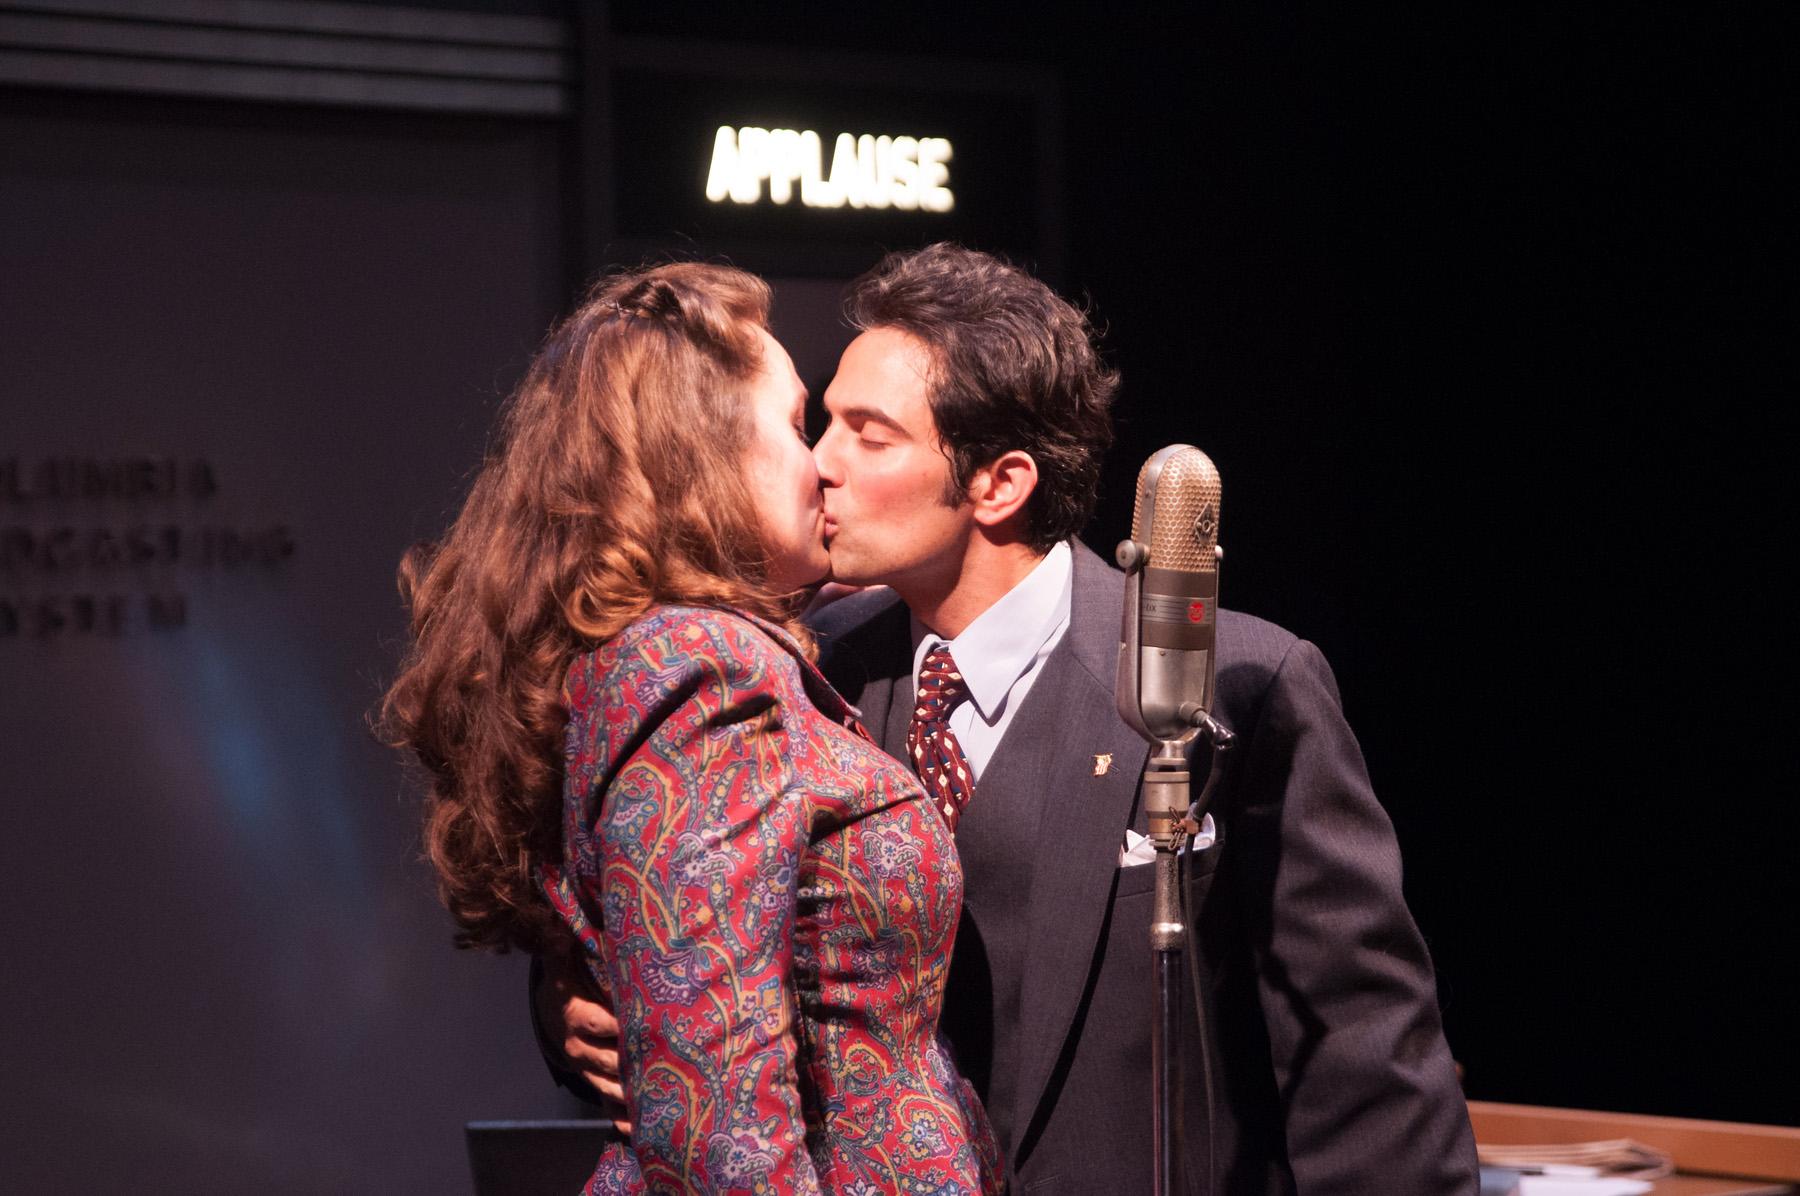 Sarah Taylor + David Joseph Photo: Enrico Spada